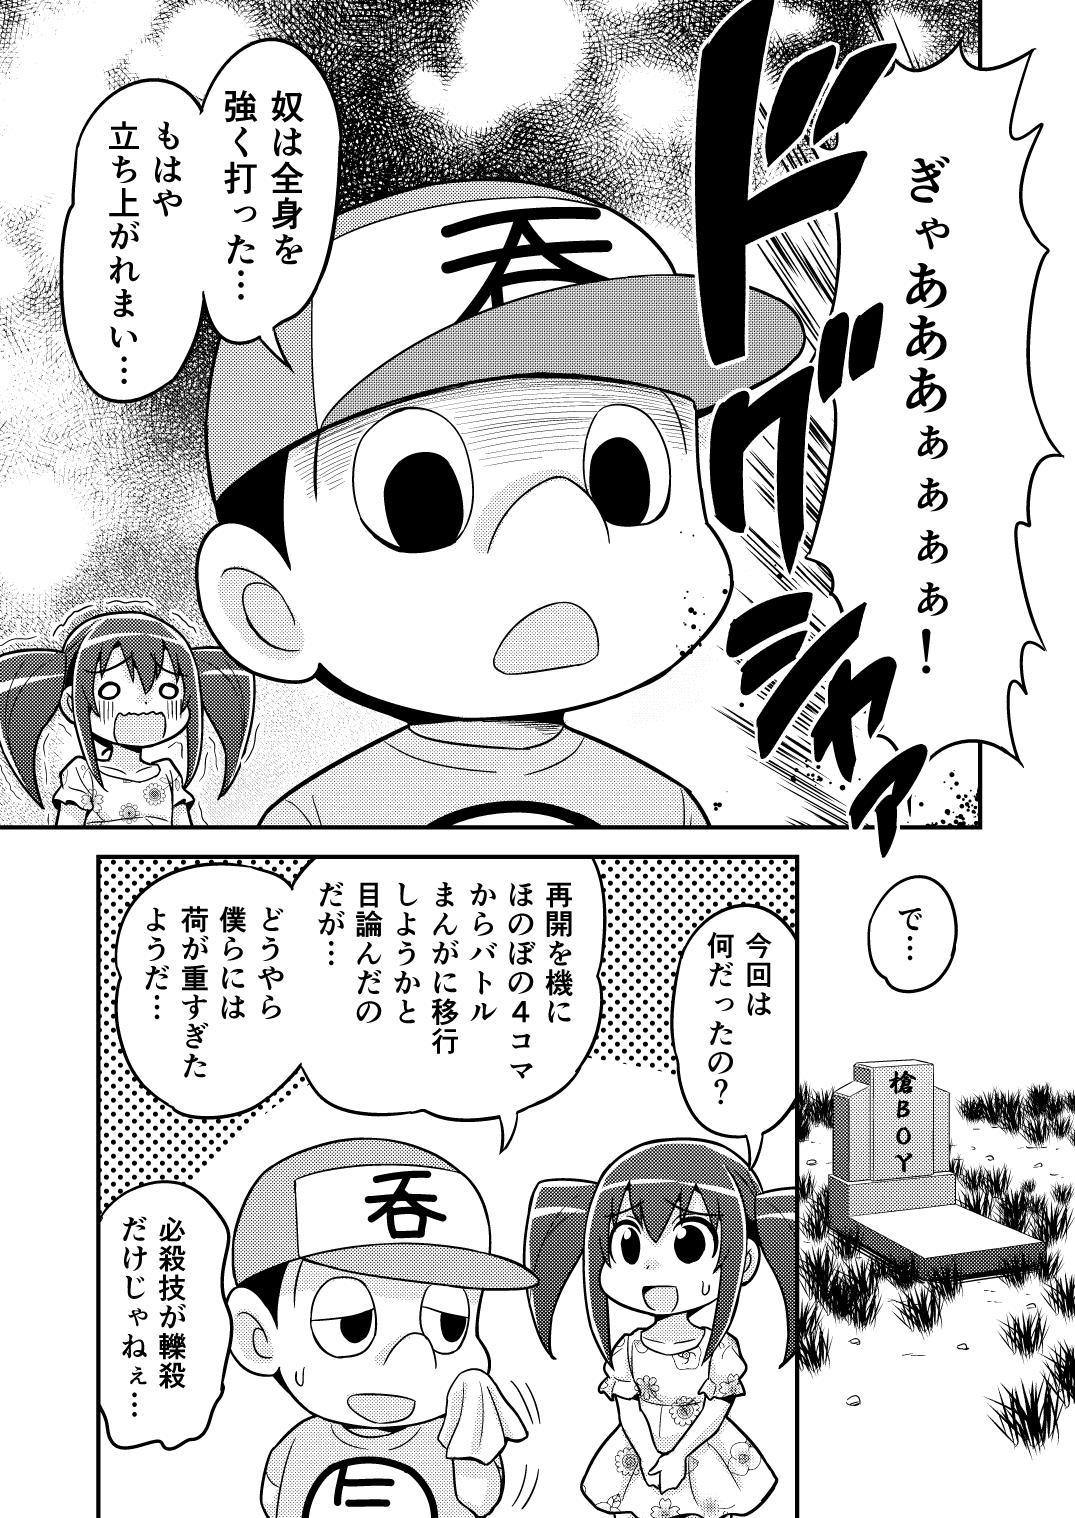 Nonki BOY Ch. 1-23 63